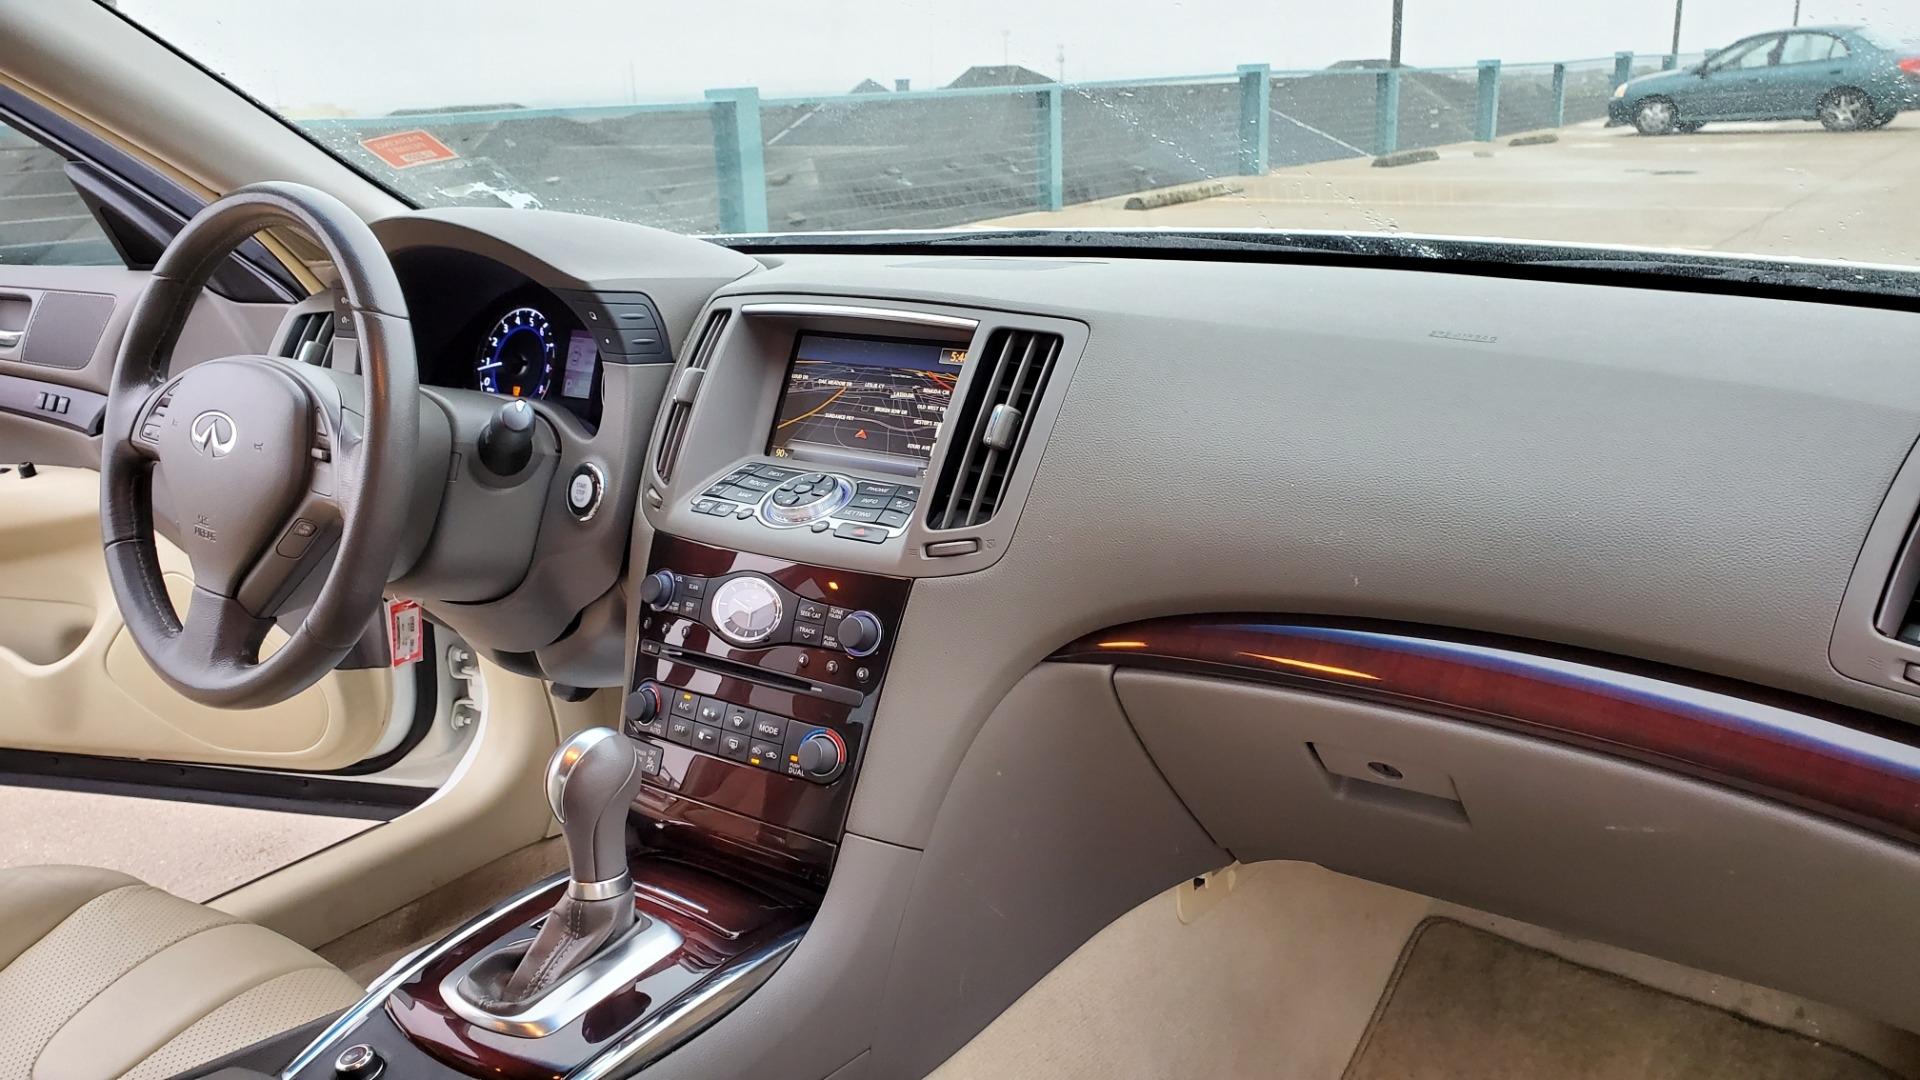 2011 Infiniti G37 Journey 80k Miles Leather Nav Sunroof Drives Exellent 1000 Down Waa Friendly Motors Group Fmg Dealership In Austin